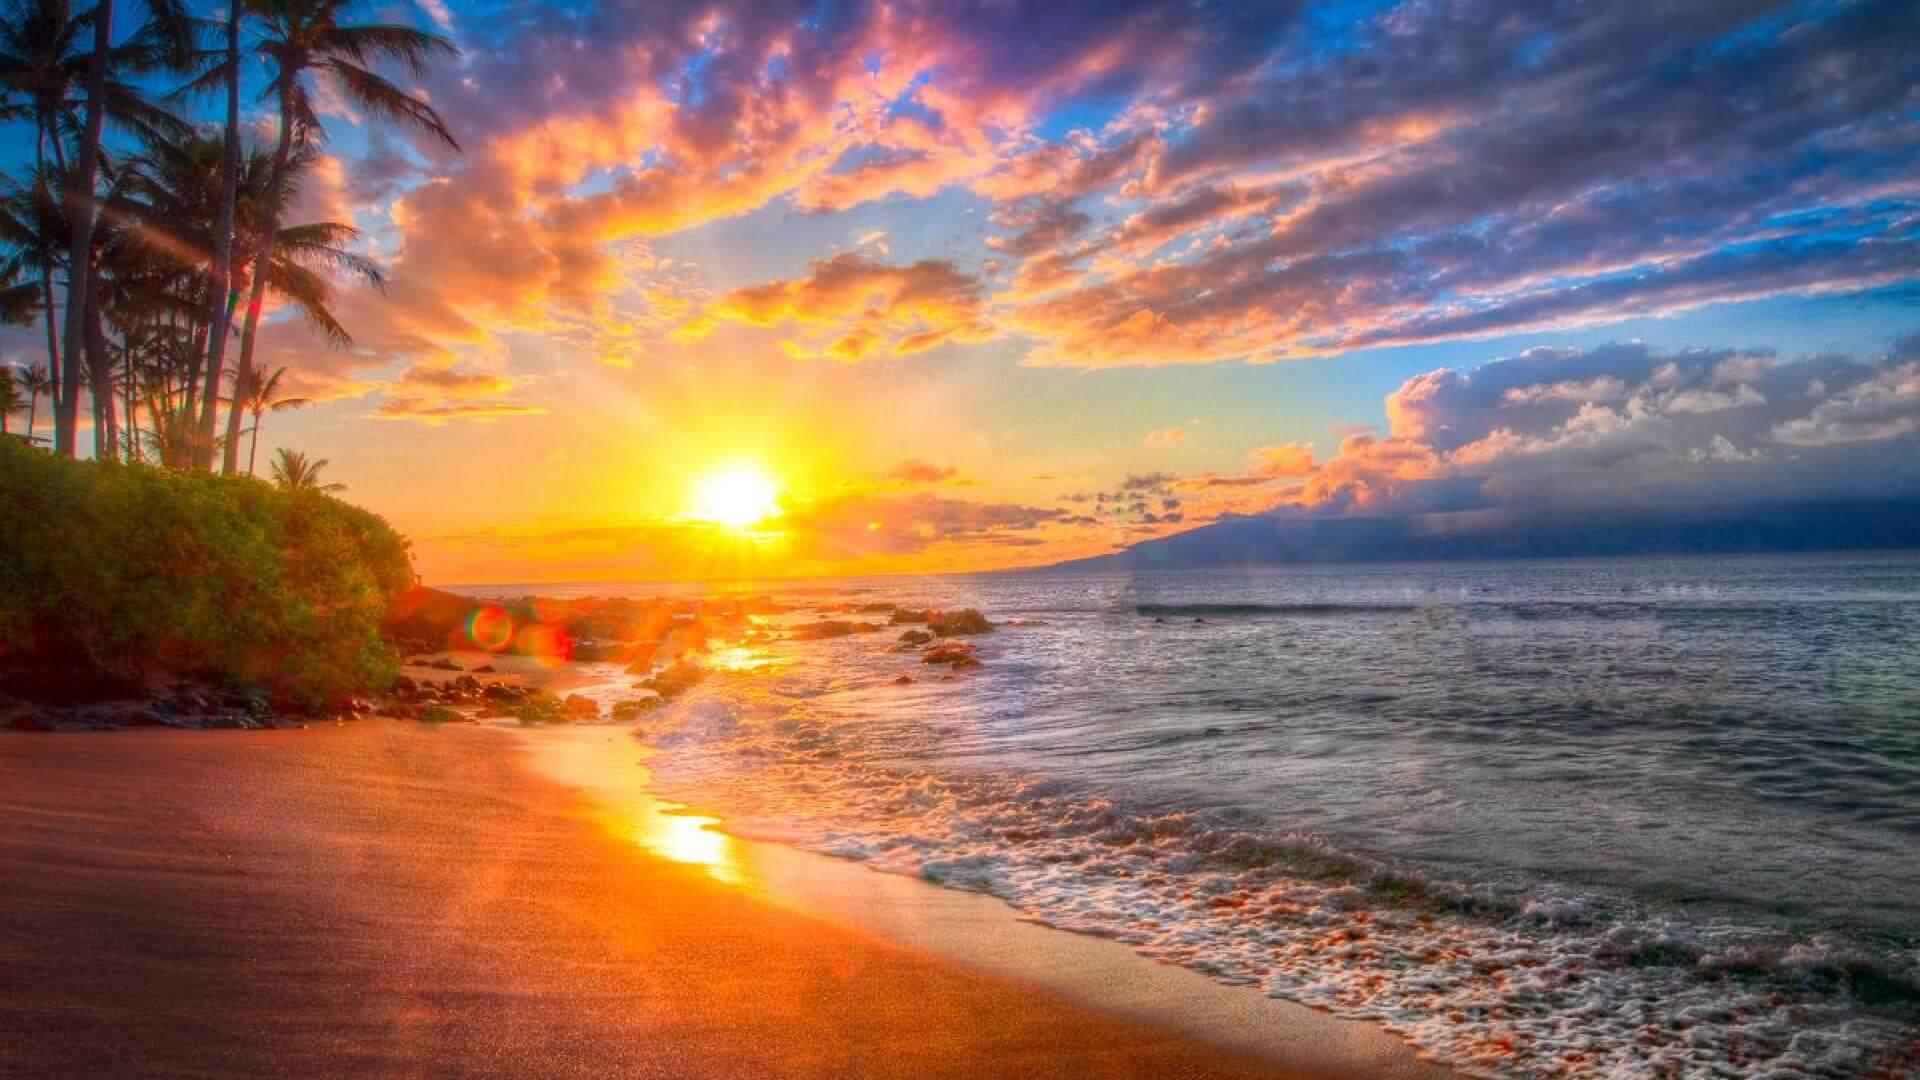 Hawaiian Beach Sunset Wallpaper Background: Bill B. Fulfills His Hawaiian Dream